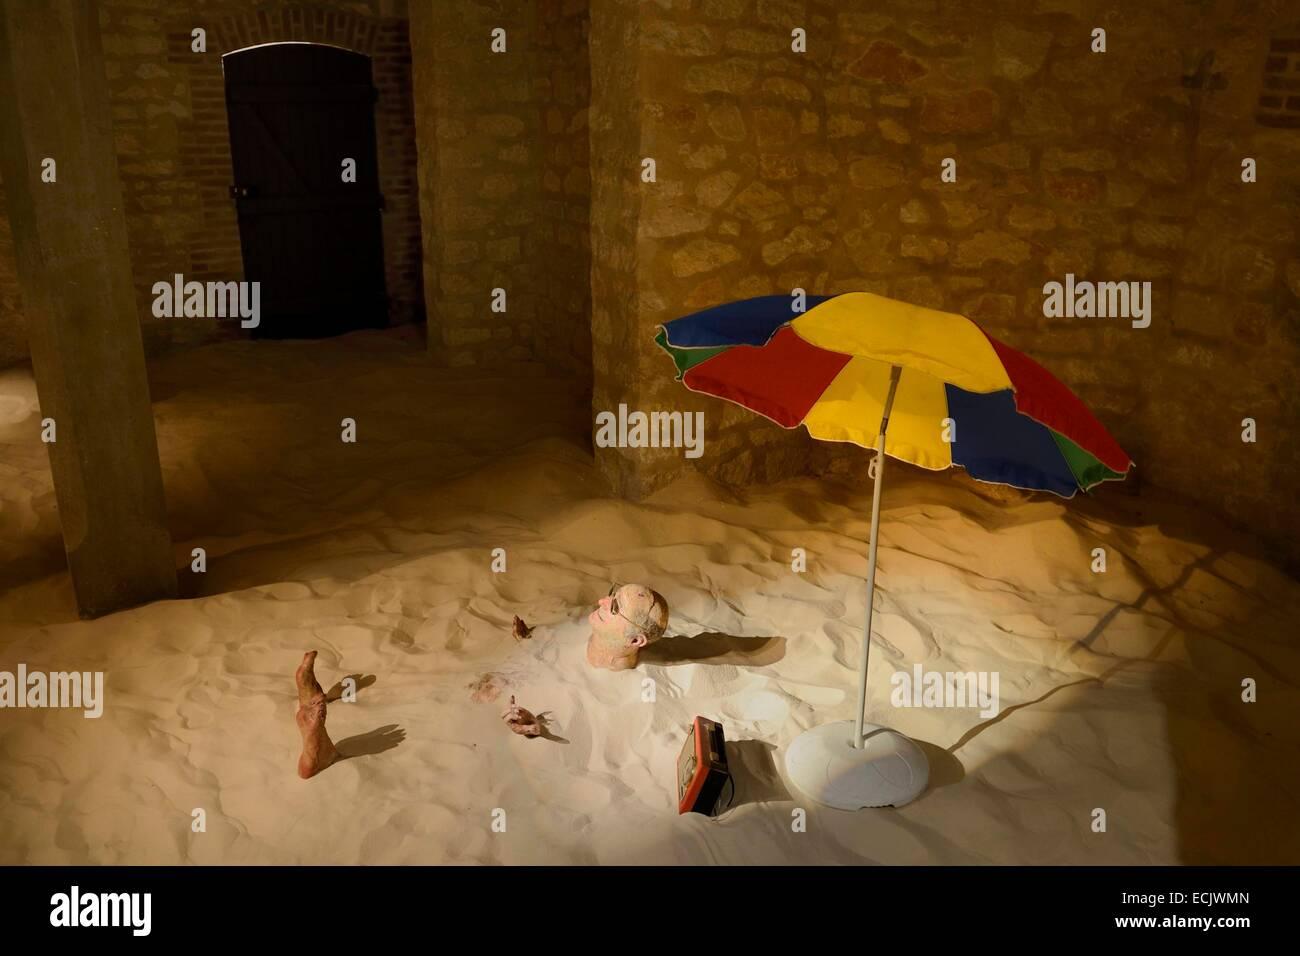 France, Marne, Reims, the Villa Demoiselle, Sunbath (2008) by Enrique Marty - Stock Image